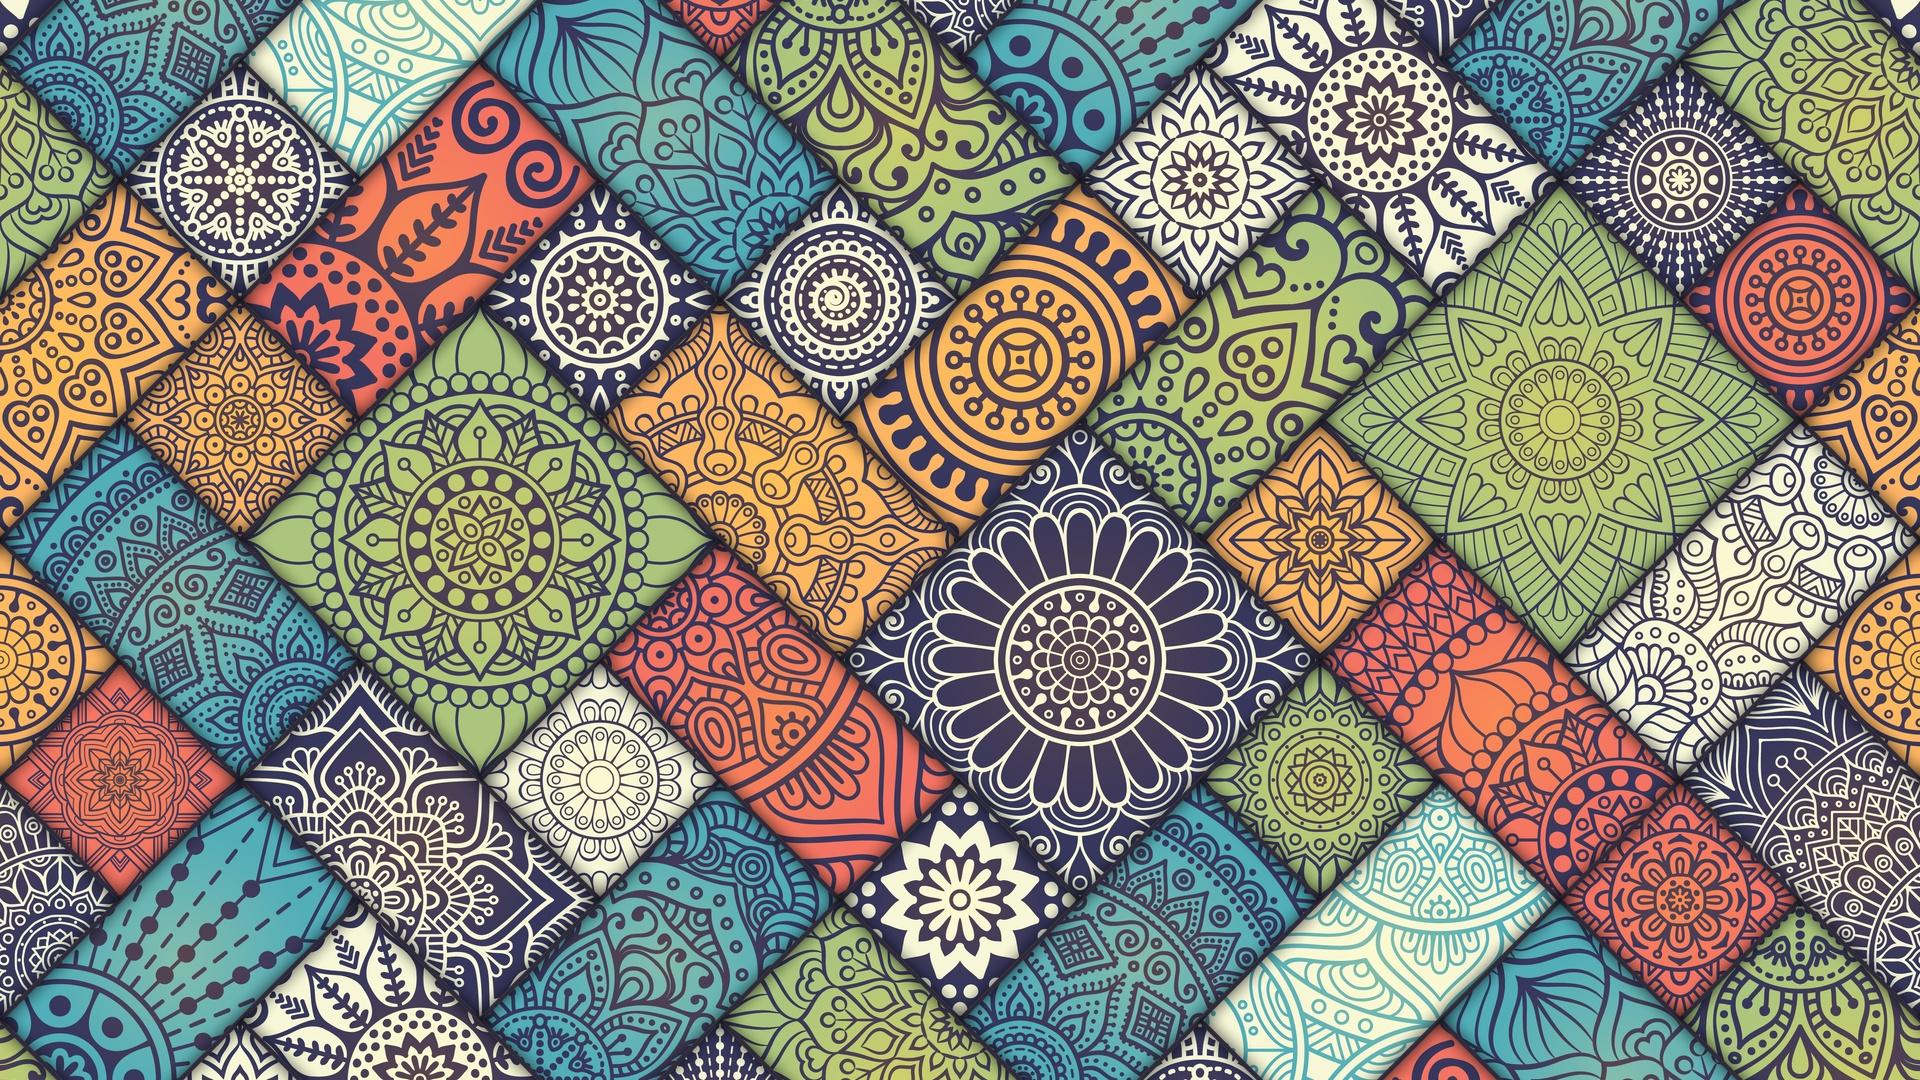 1920x1080 mandala pattern abstract 5k laptop full hd 1080p - Hd pattern wallpapers 1080p ...